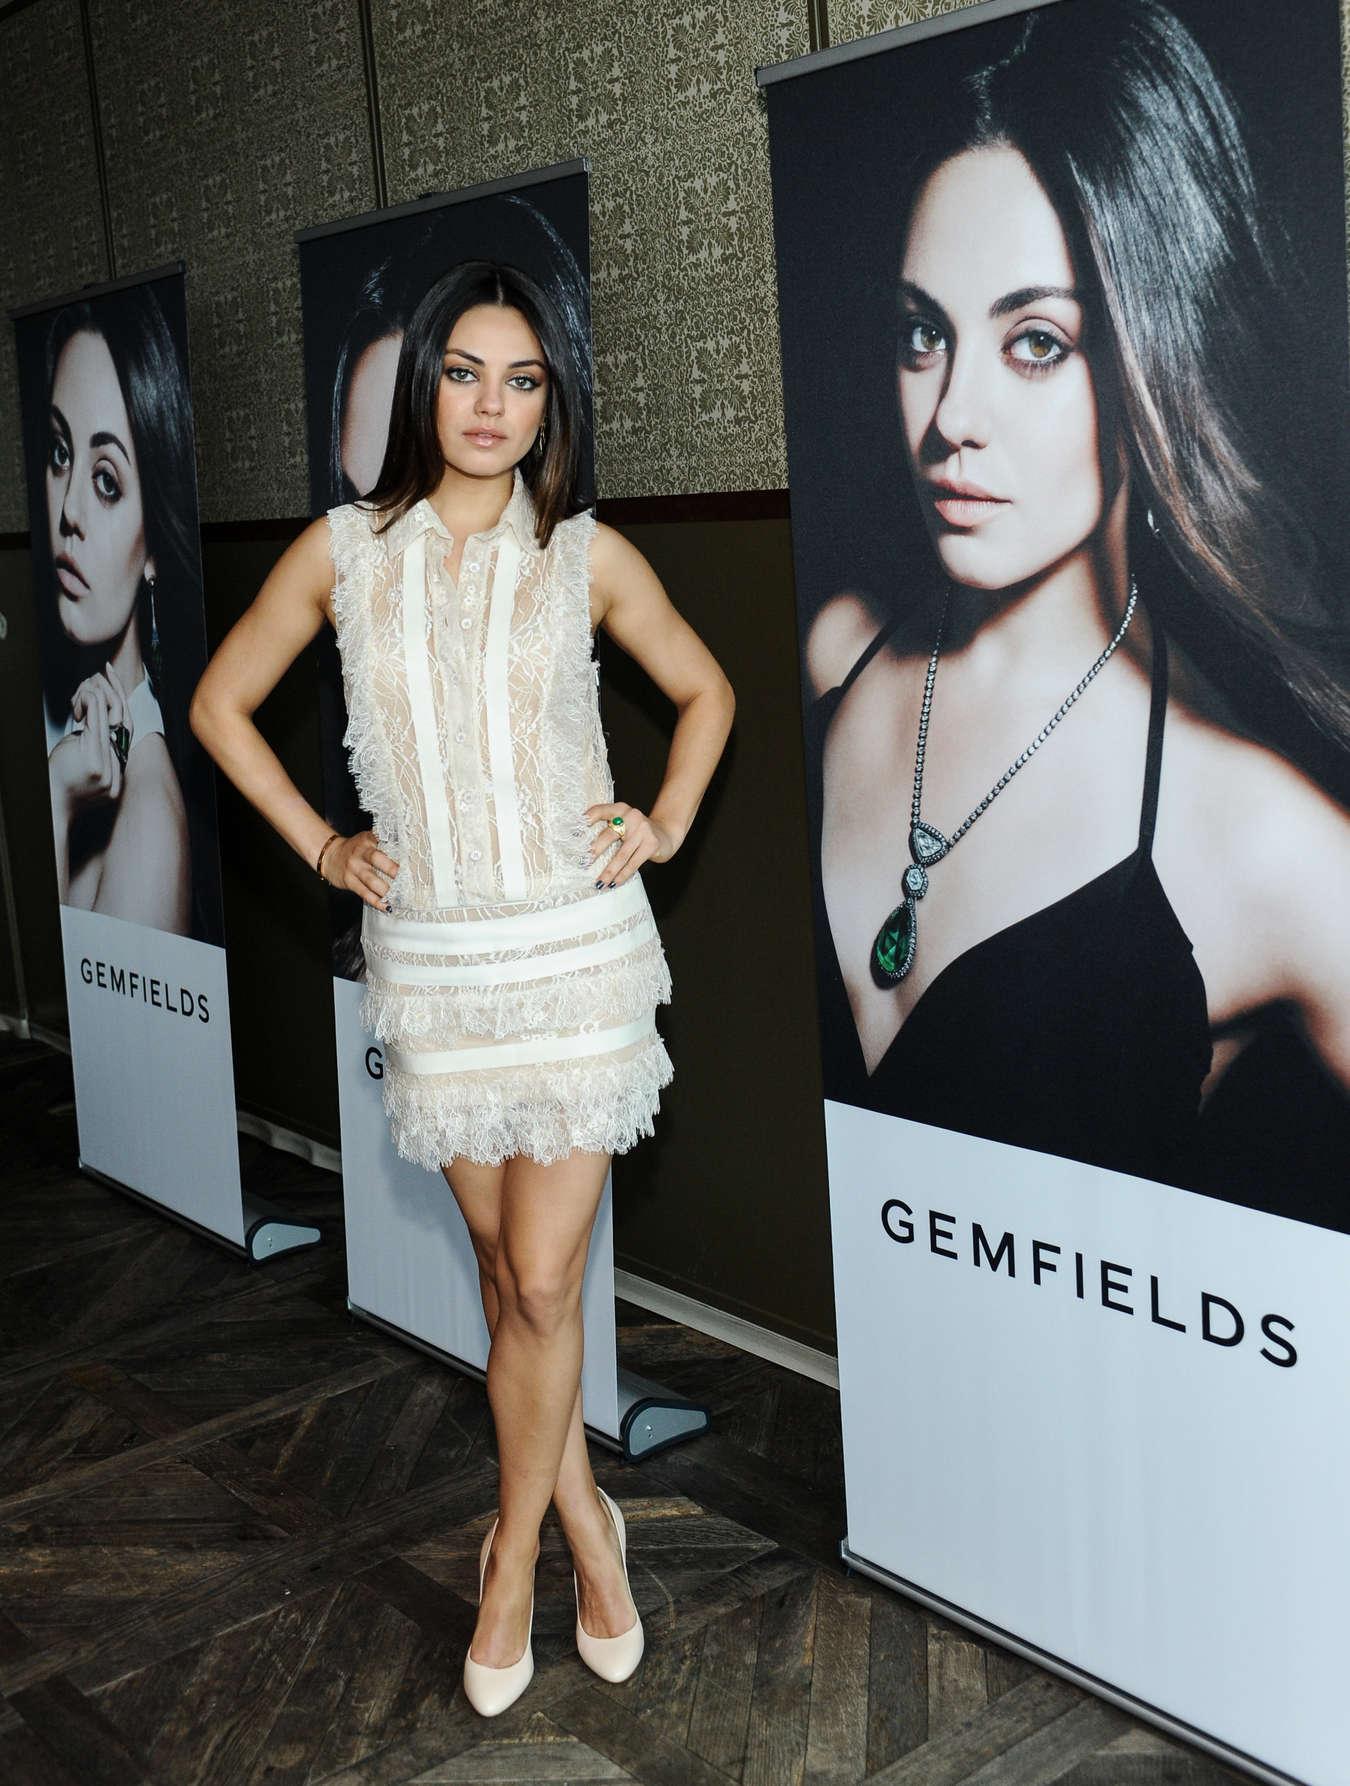 Mila-Kunis---Gemfields-New-Brand-Ambassa